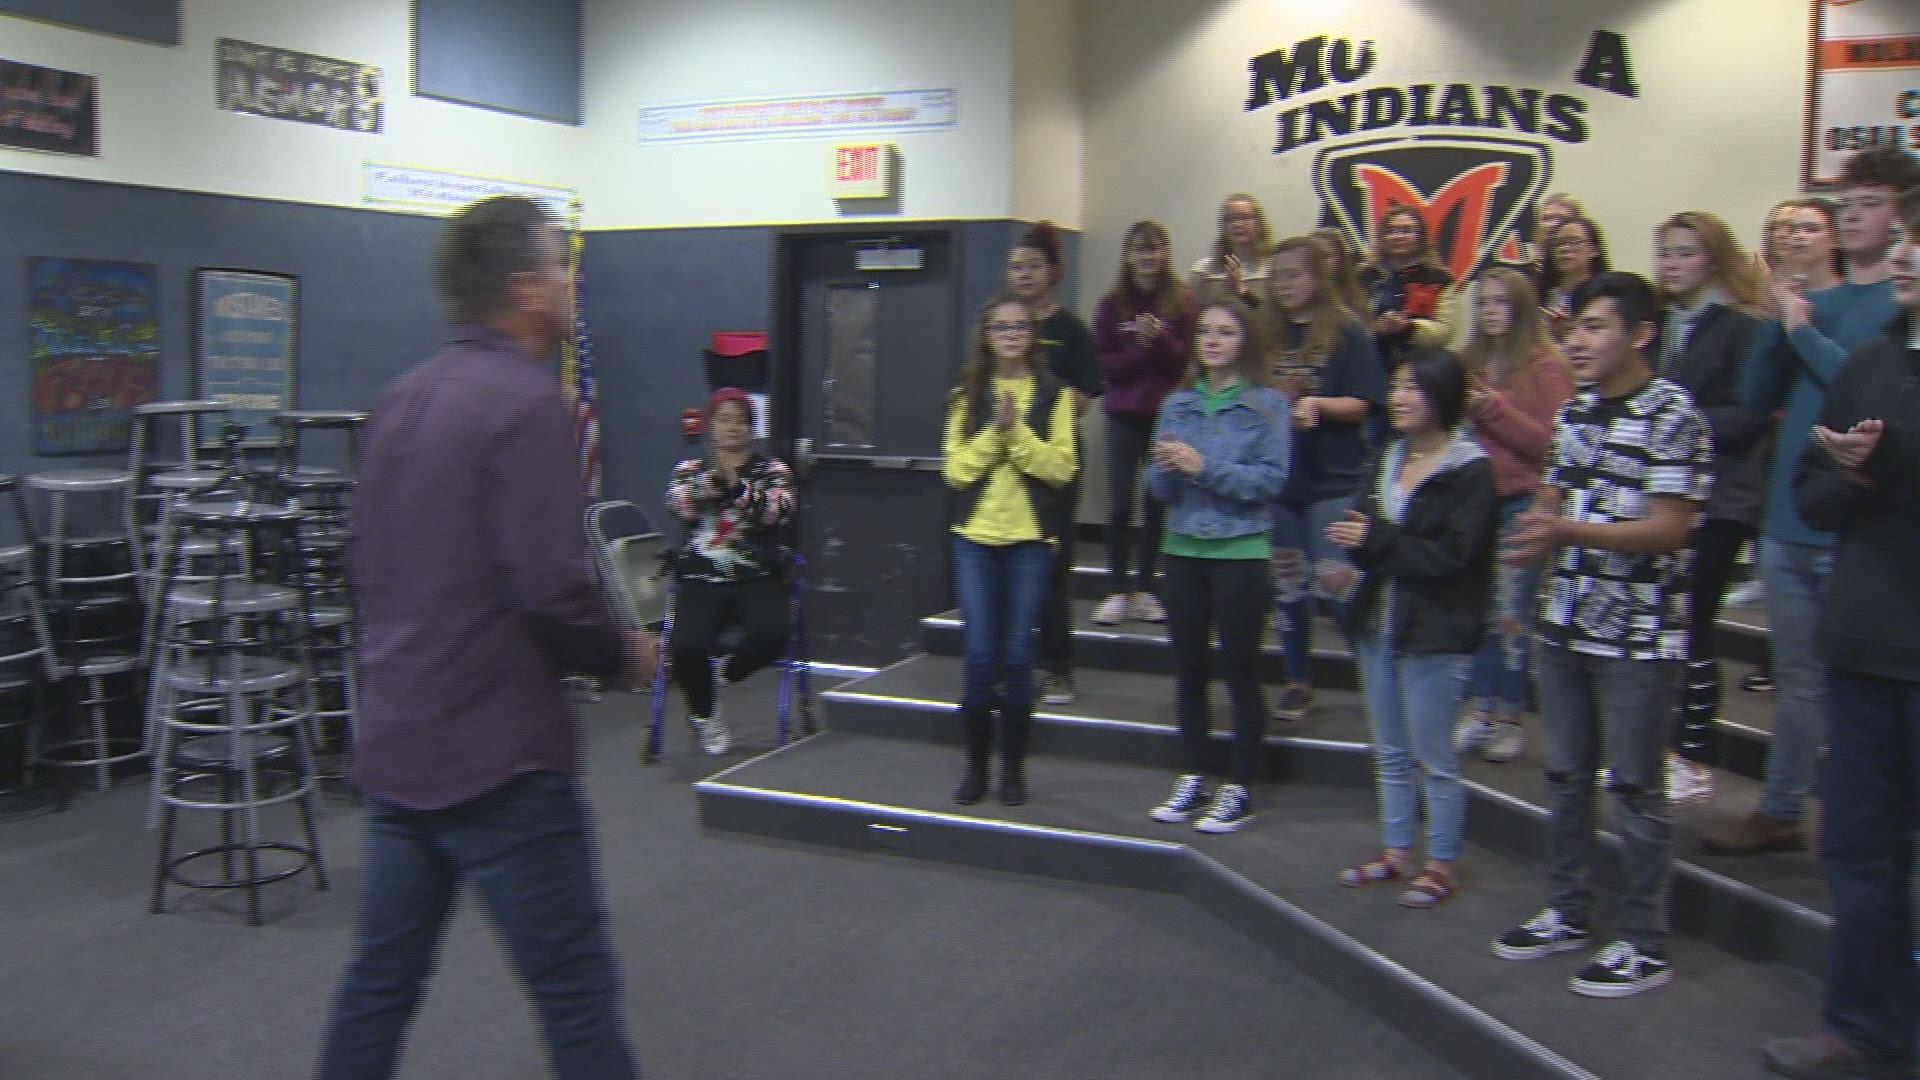 Molalla High School Singing Christmas Tree 2020 Molalla Singing Christmas Tree likely ending with retirement of